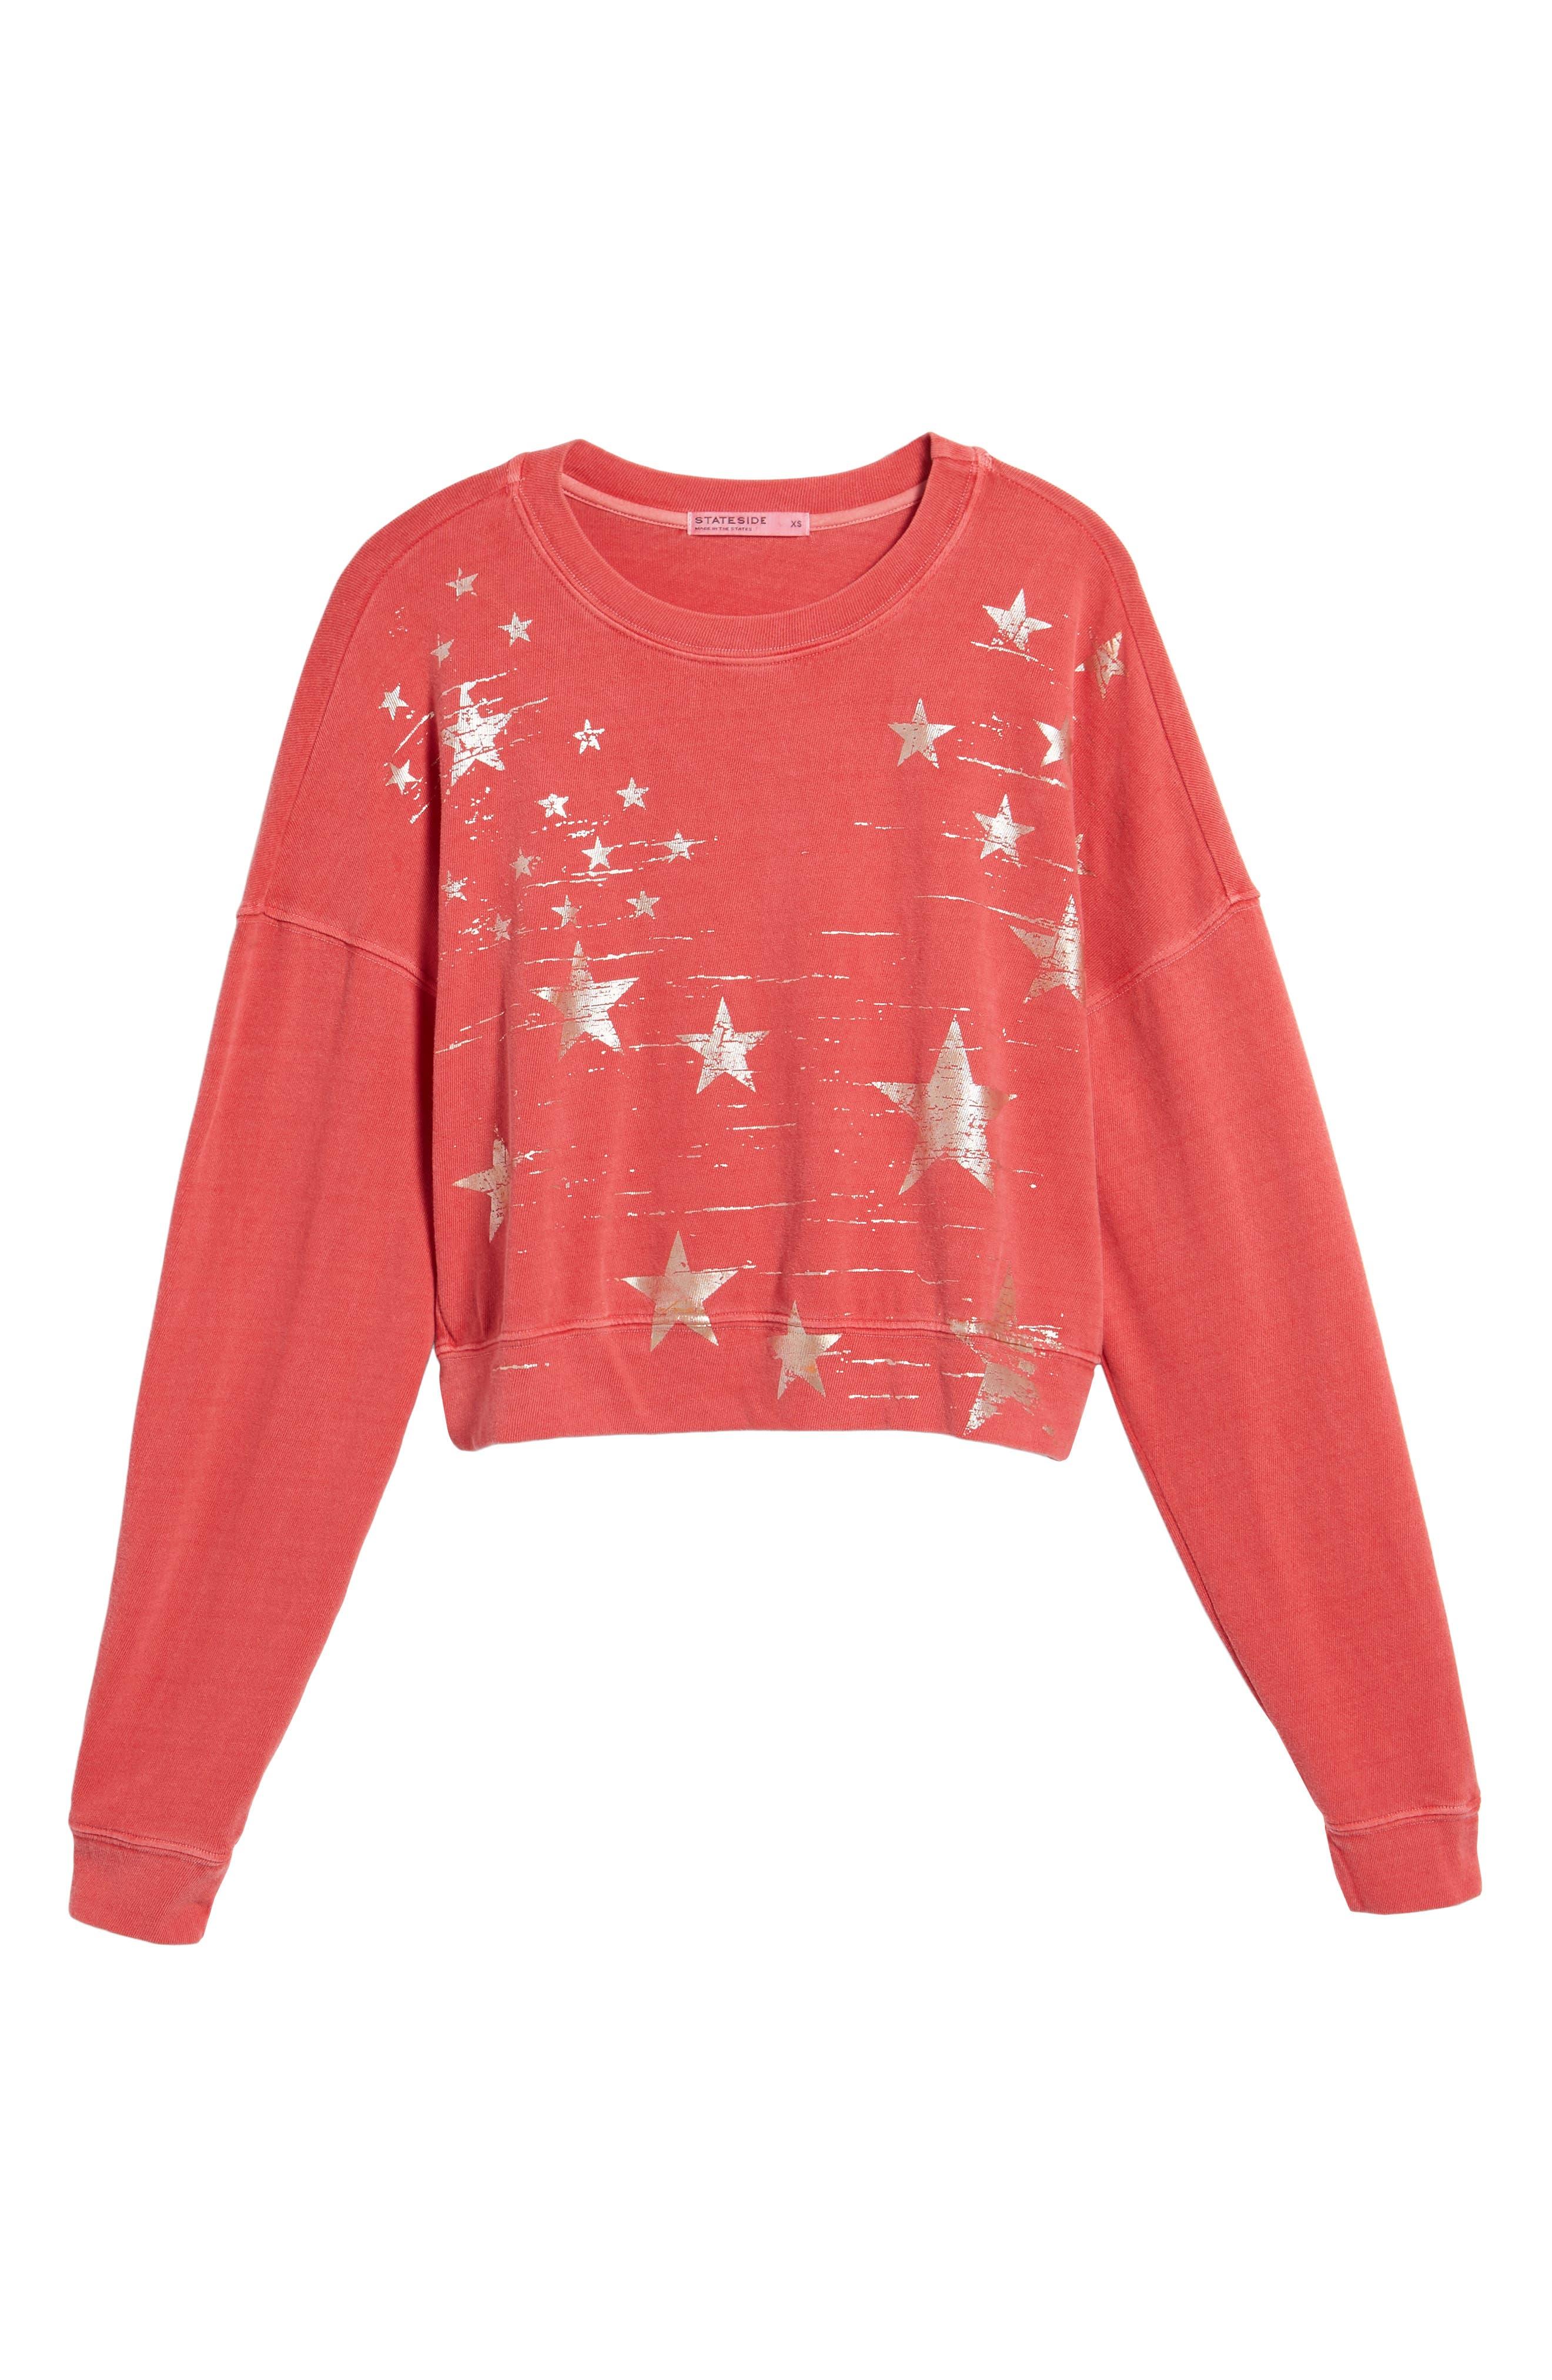 Foil Star Sweatshirt,                             Alternate thumbnail 6, color,                             600